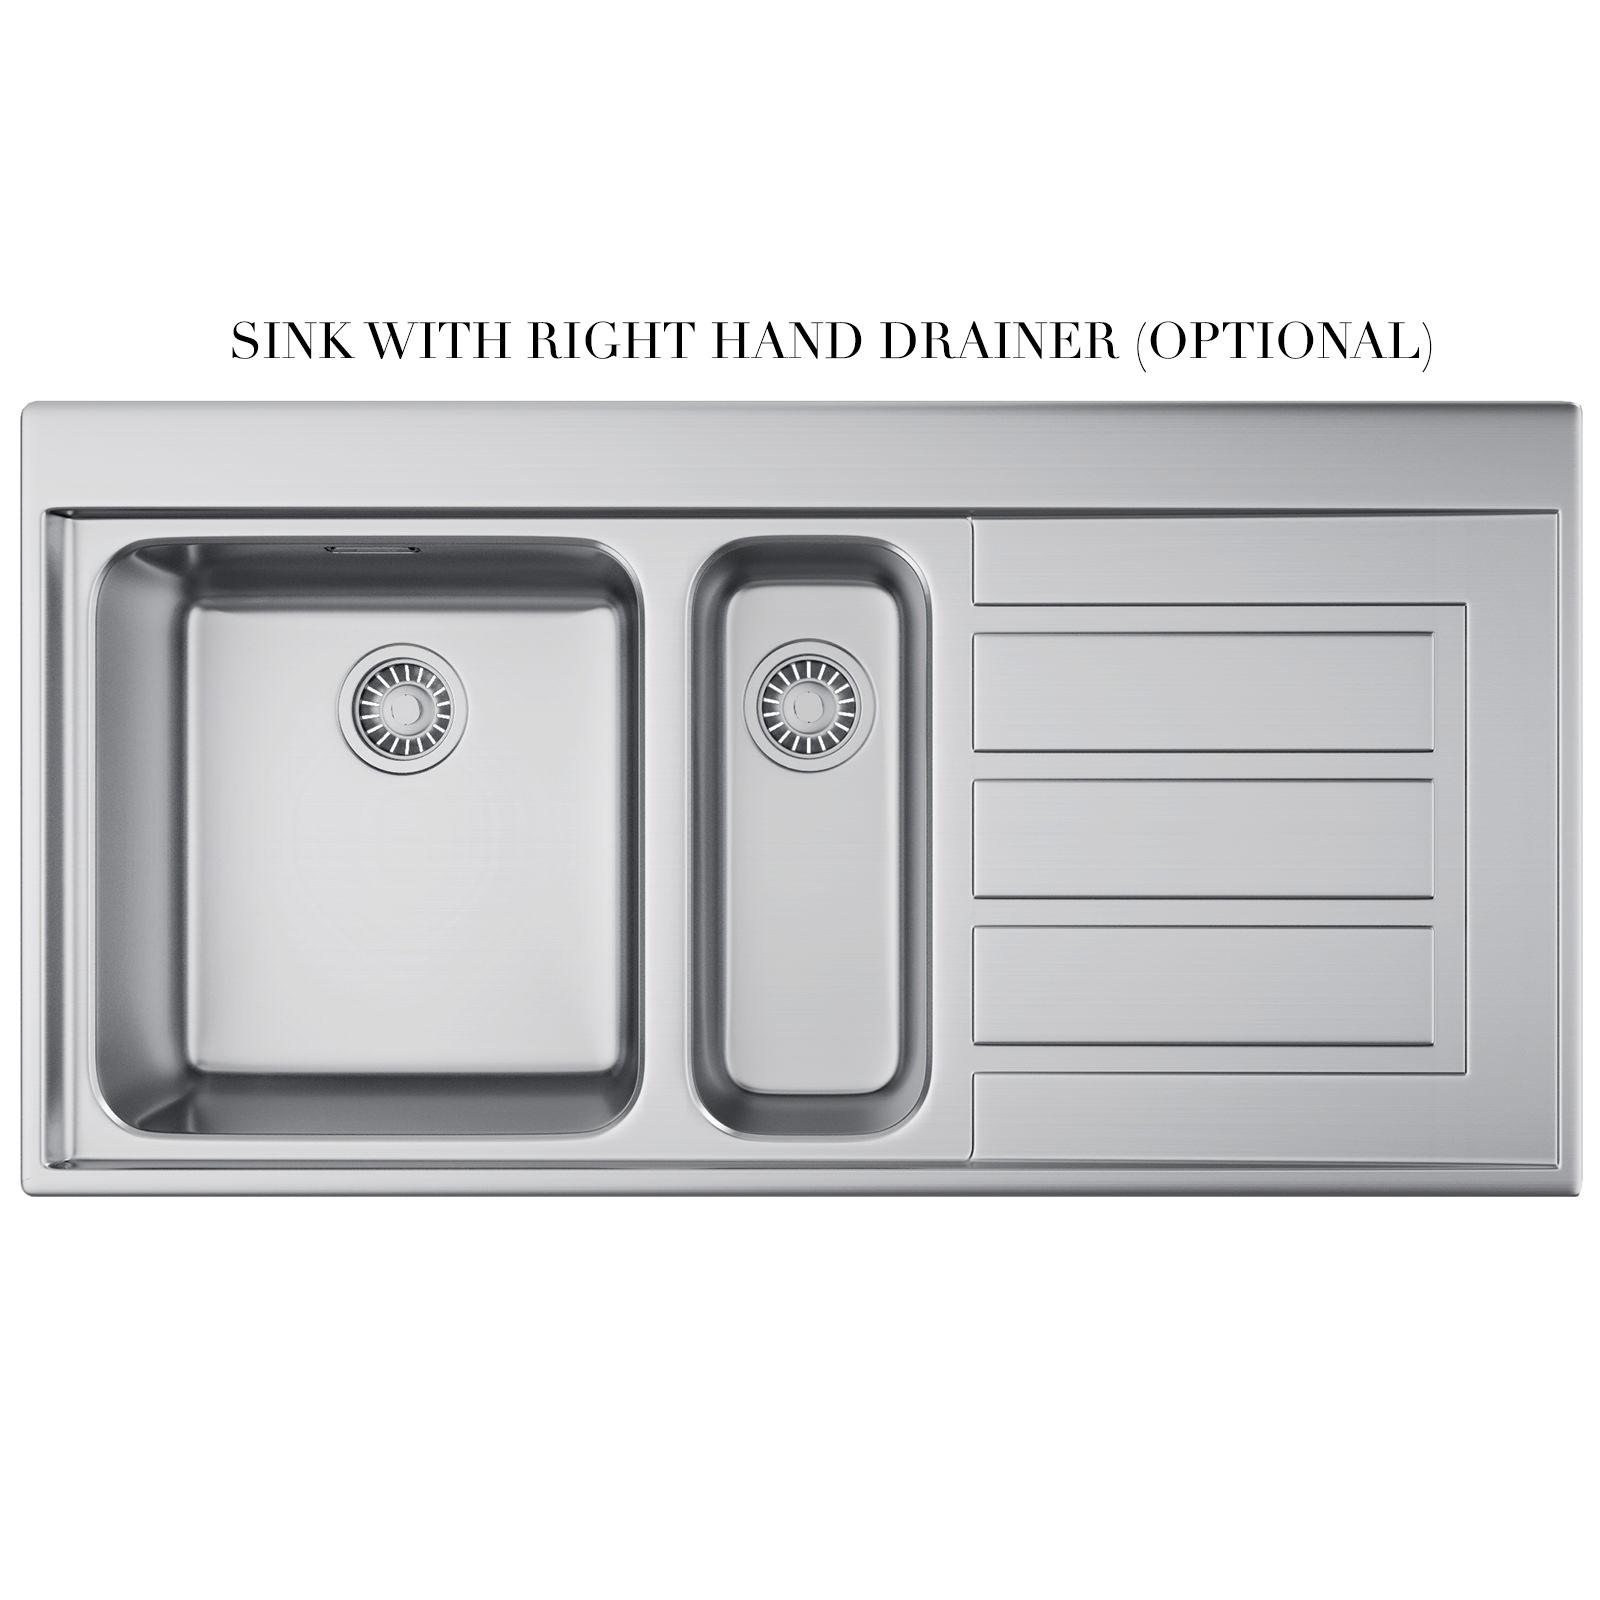 Franke 651 Sink : ... of Franke Epos EOX 651 Stainless Steel 1.5 Bowl Kitchen Inset Sink